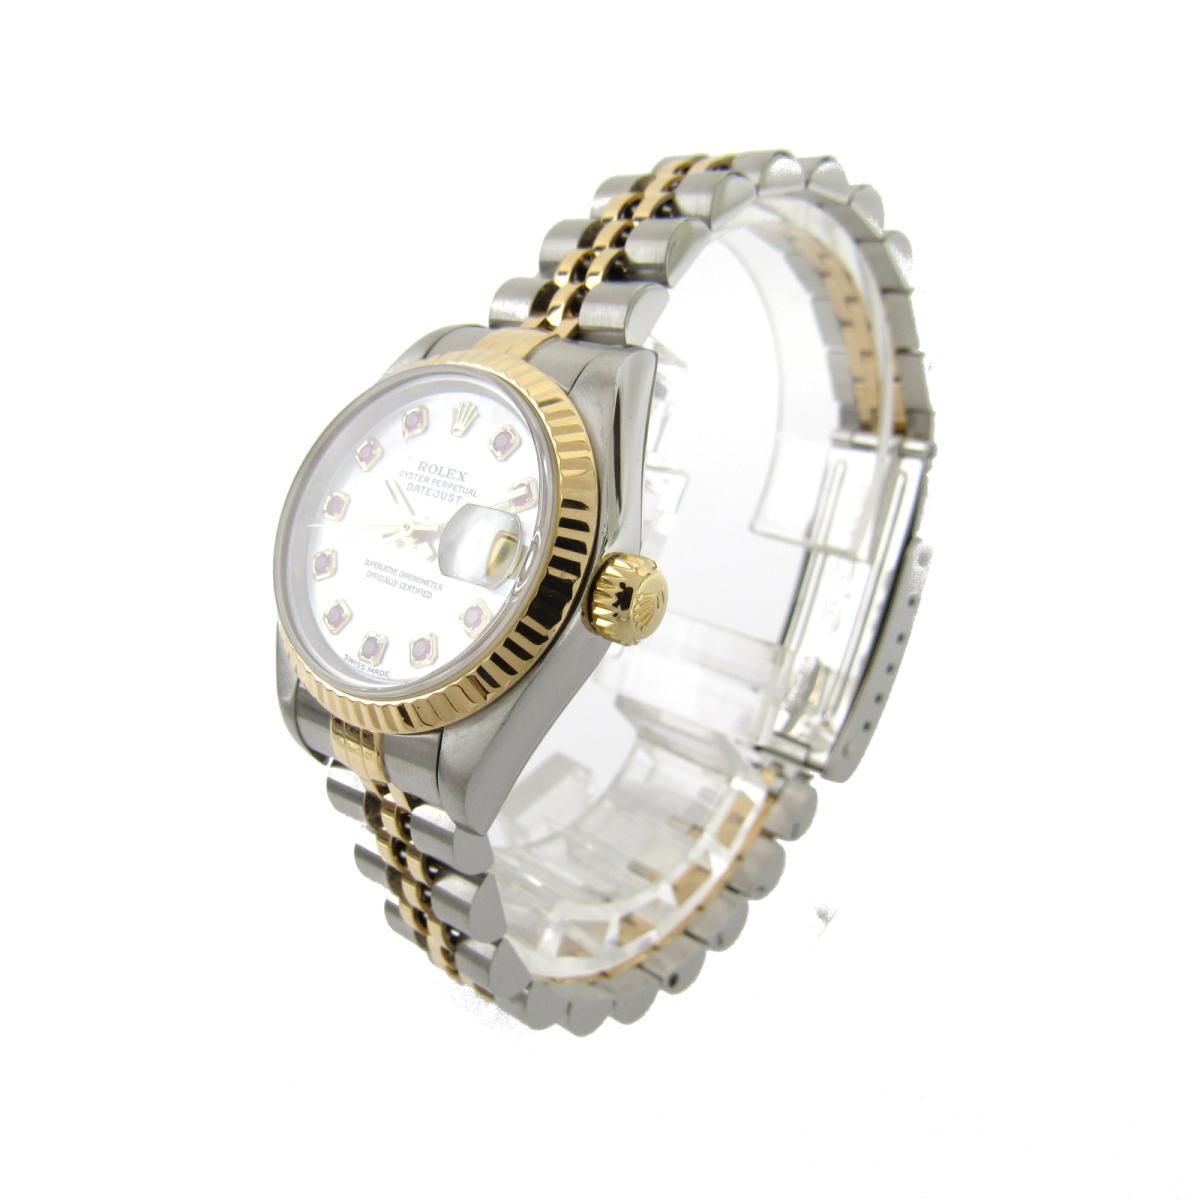 ROLEX 時計 79173NGR P番 デイトジャスト 10Pルビー/腕時計/レディース